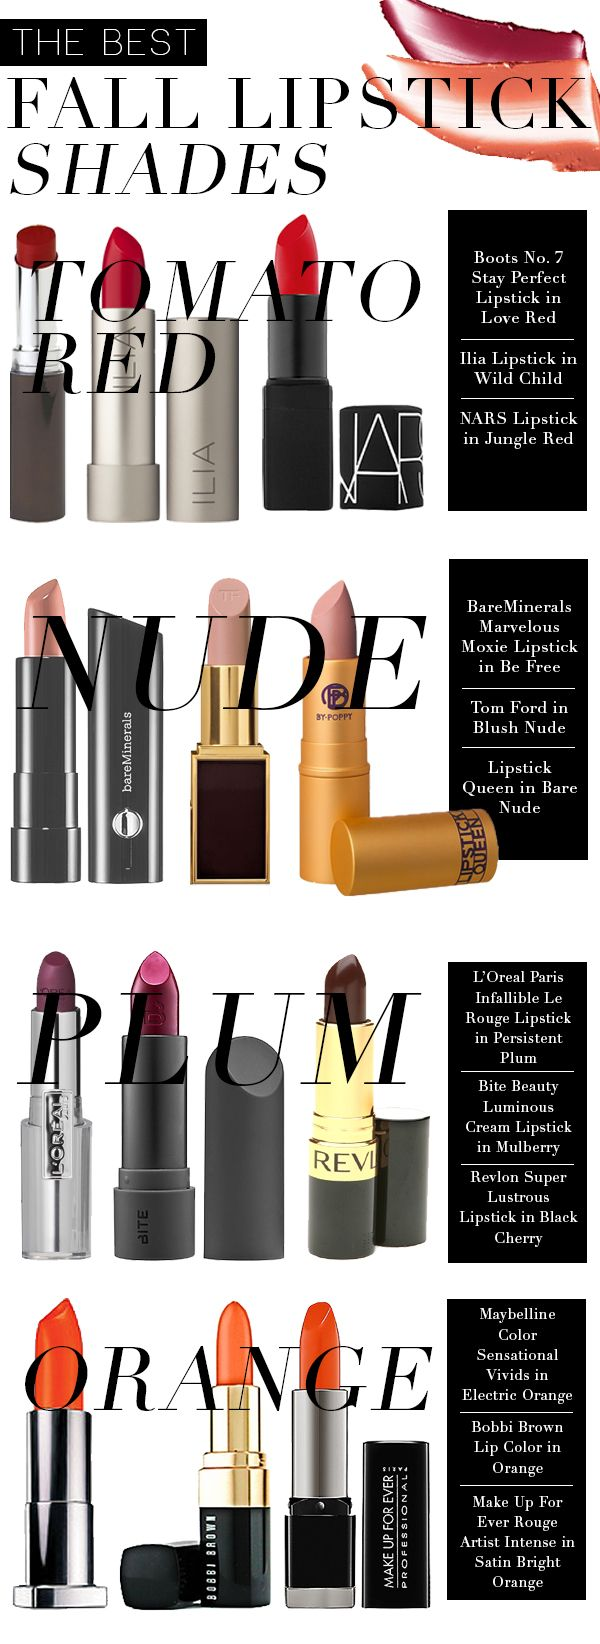 1000+ images about Lipstick on Pinterest | Best Lipsticks, Purple ...